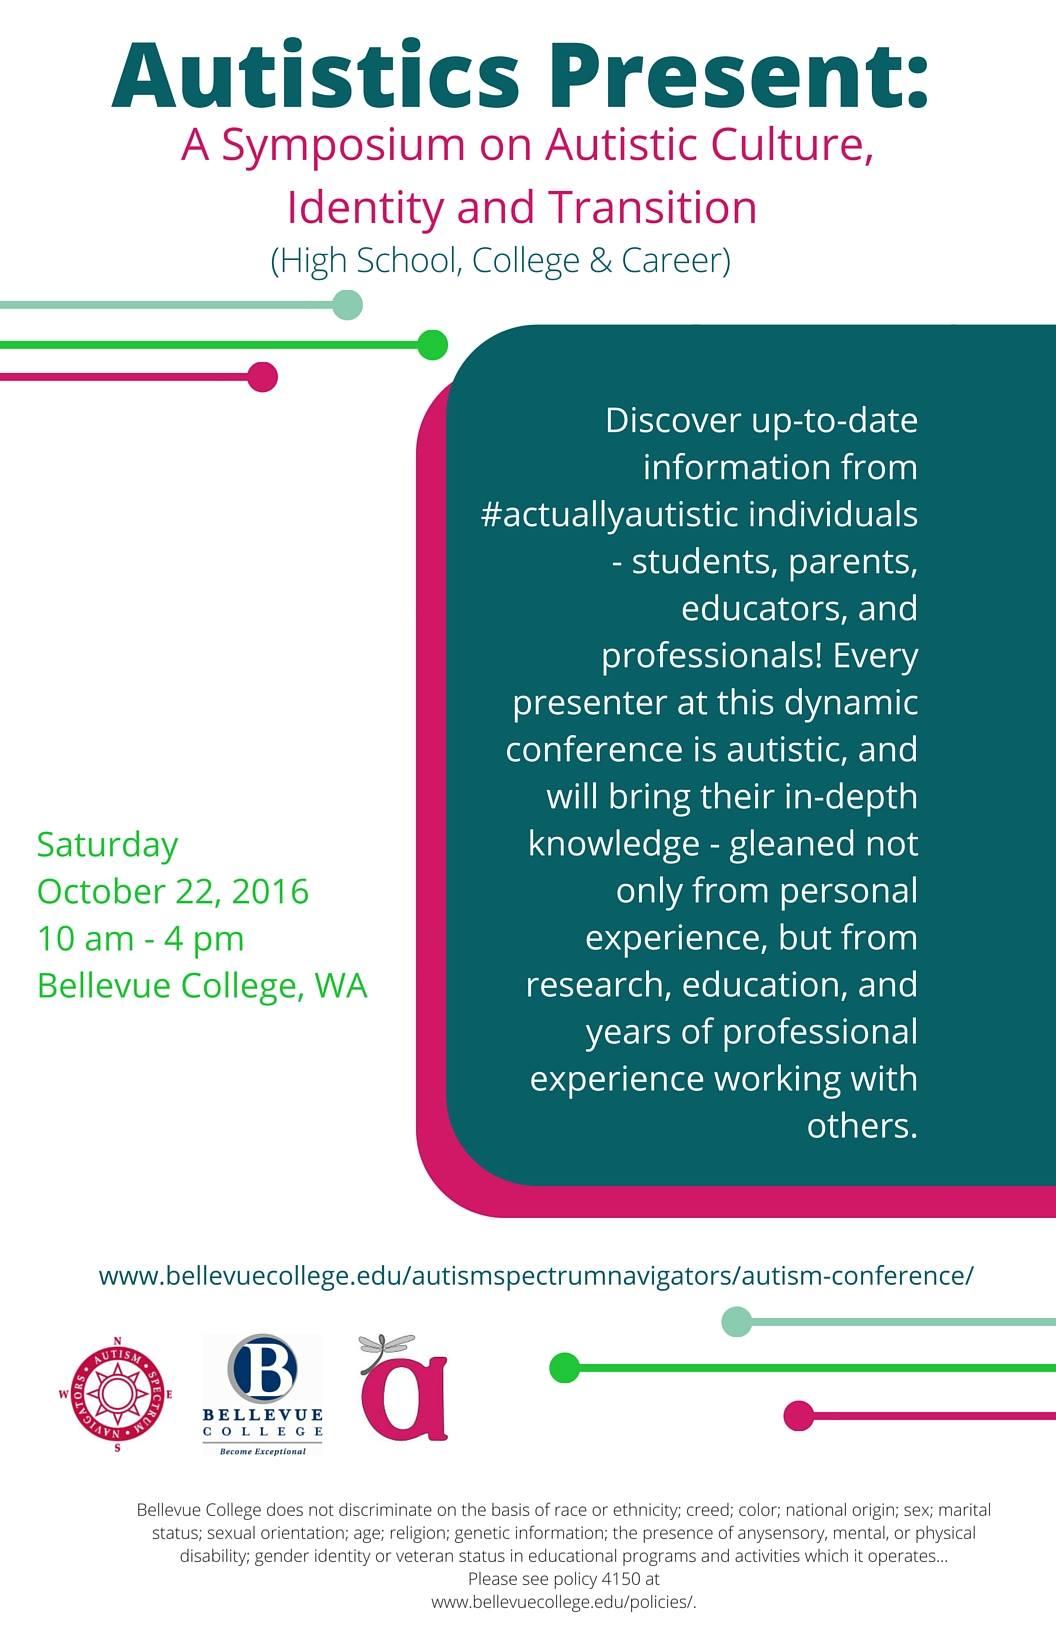 autistics present a symposium on autistic culture identity and